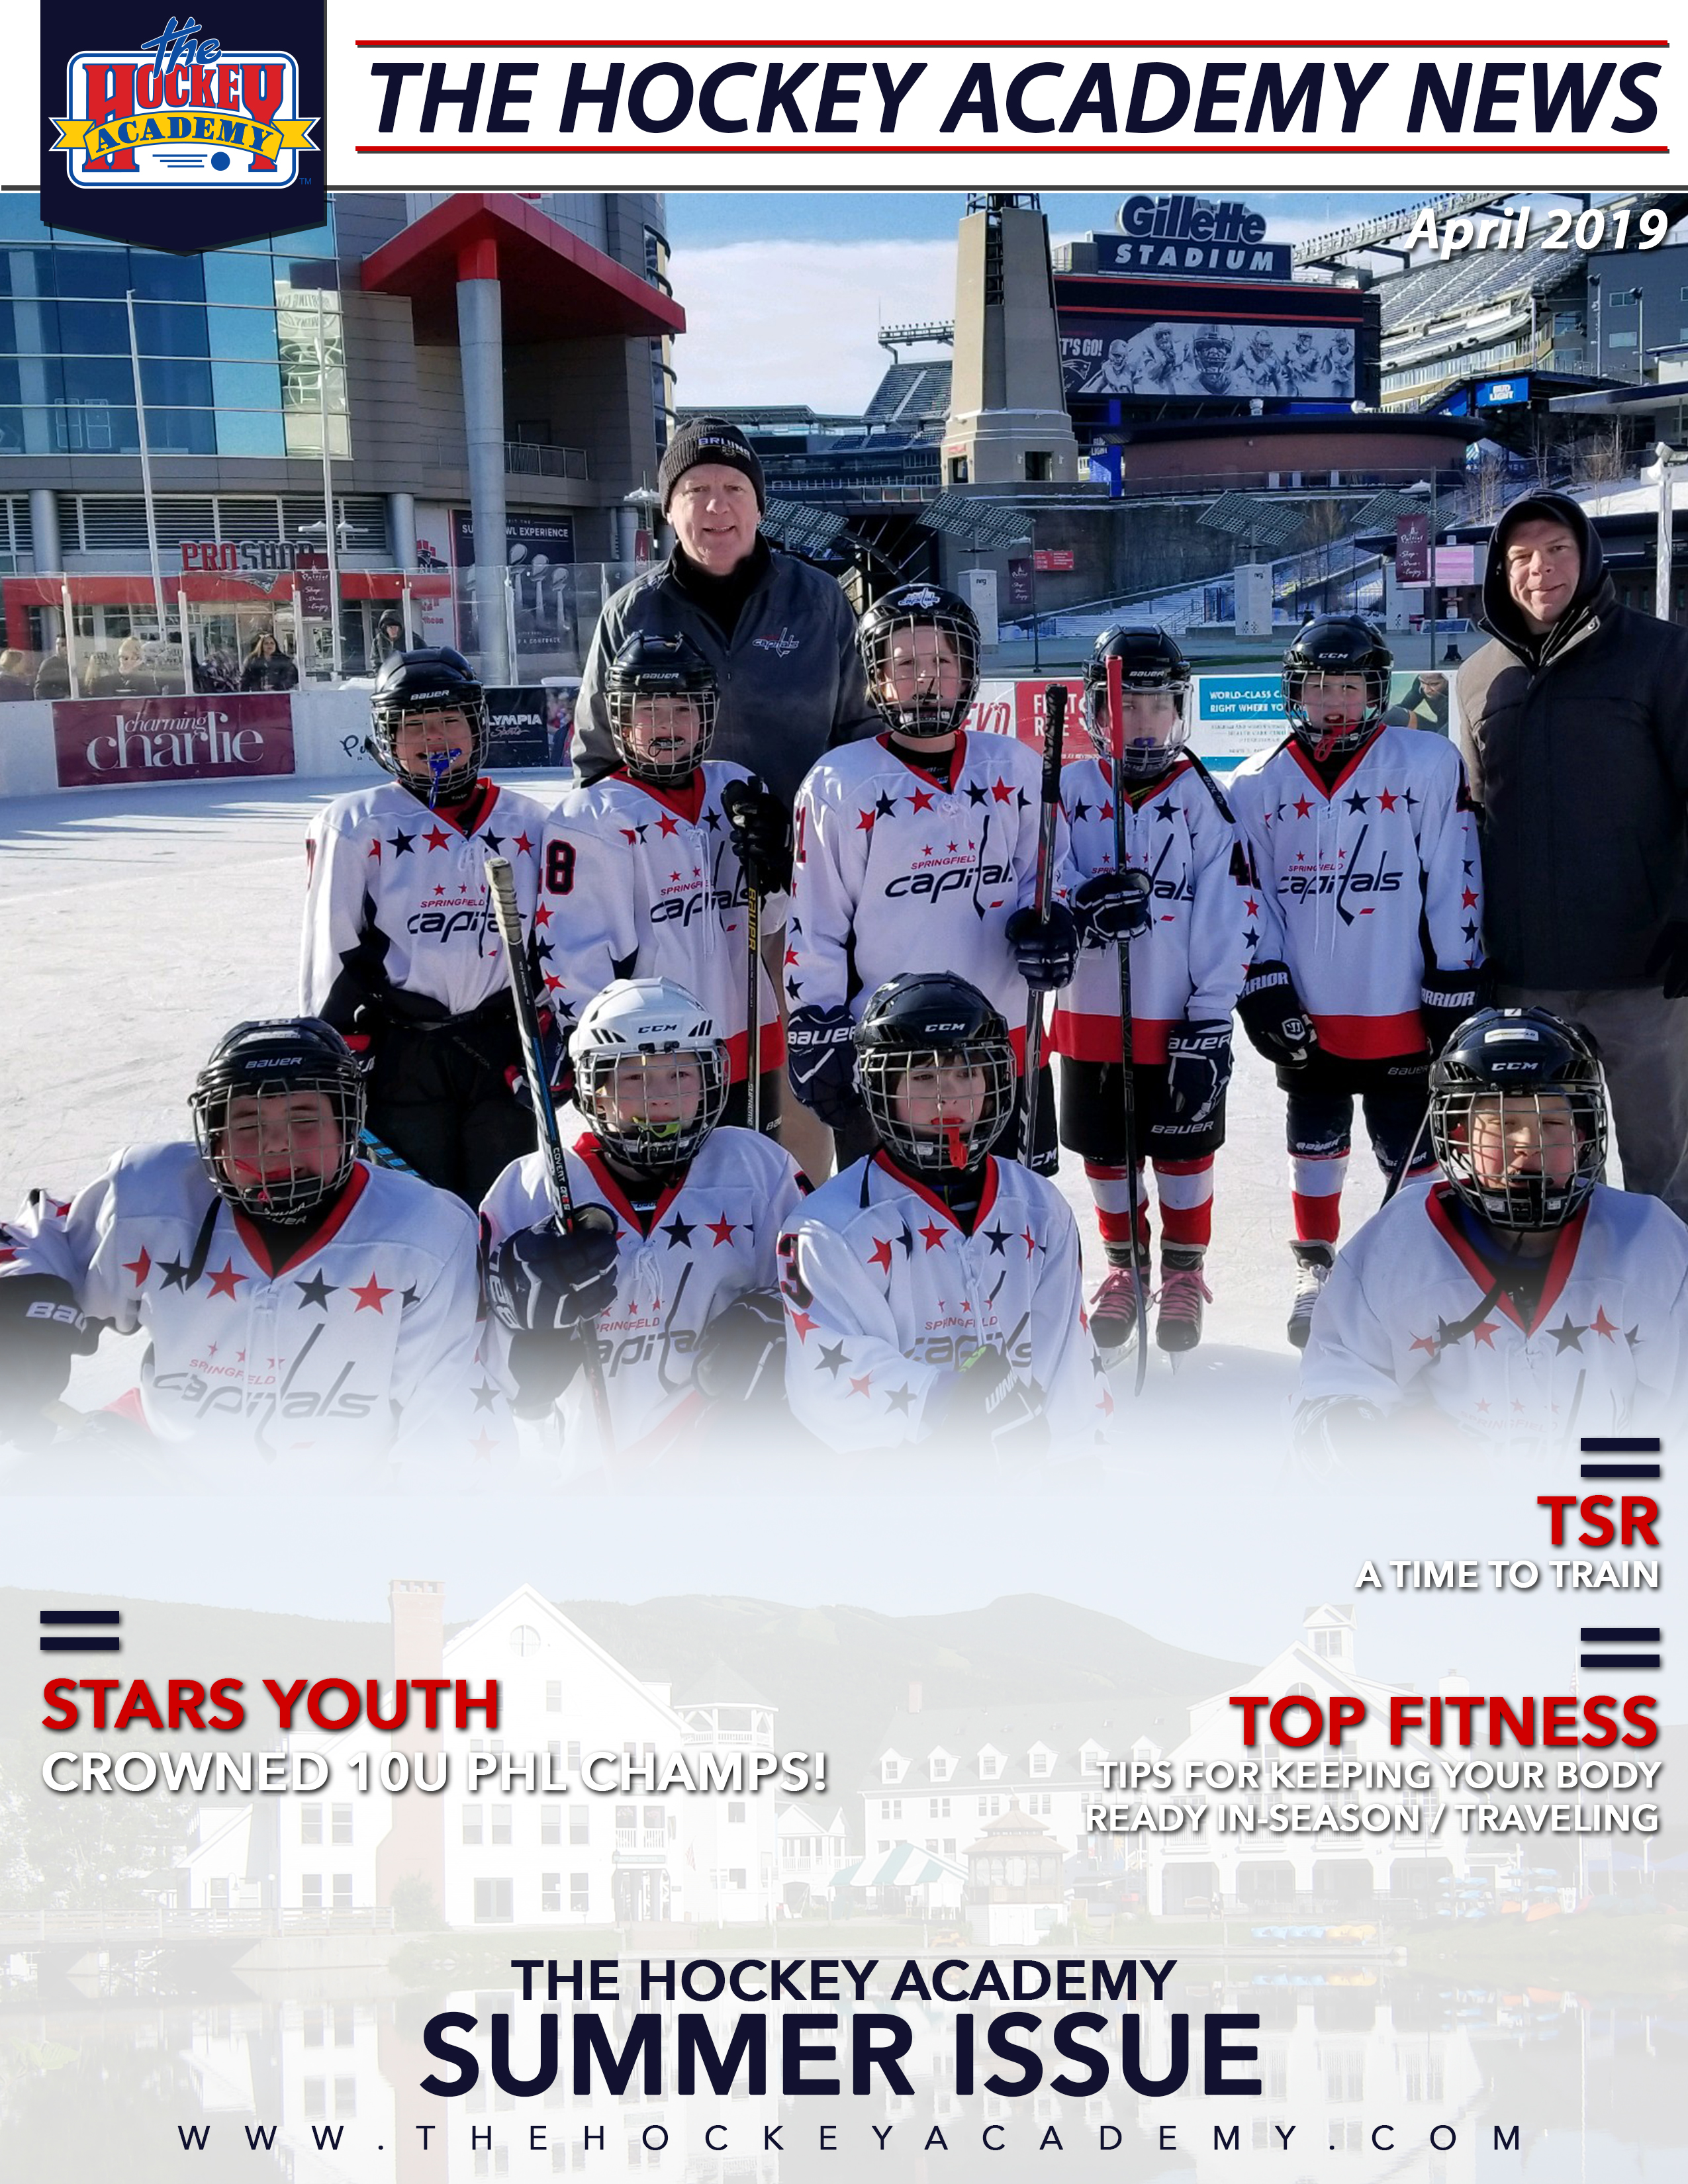 The Hockey Academy Tournaments